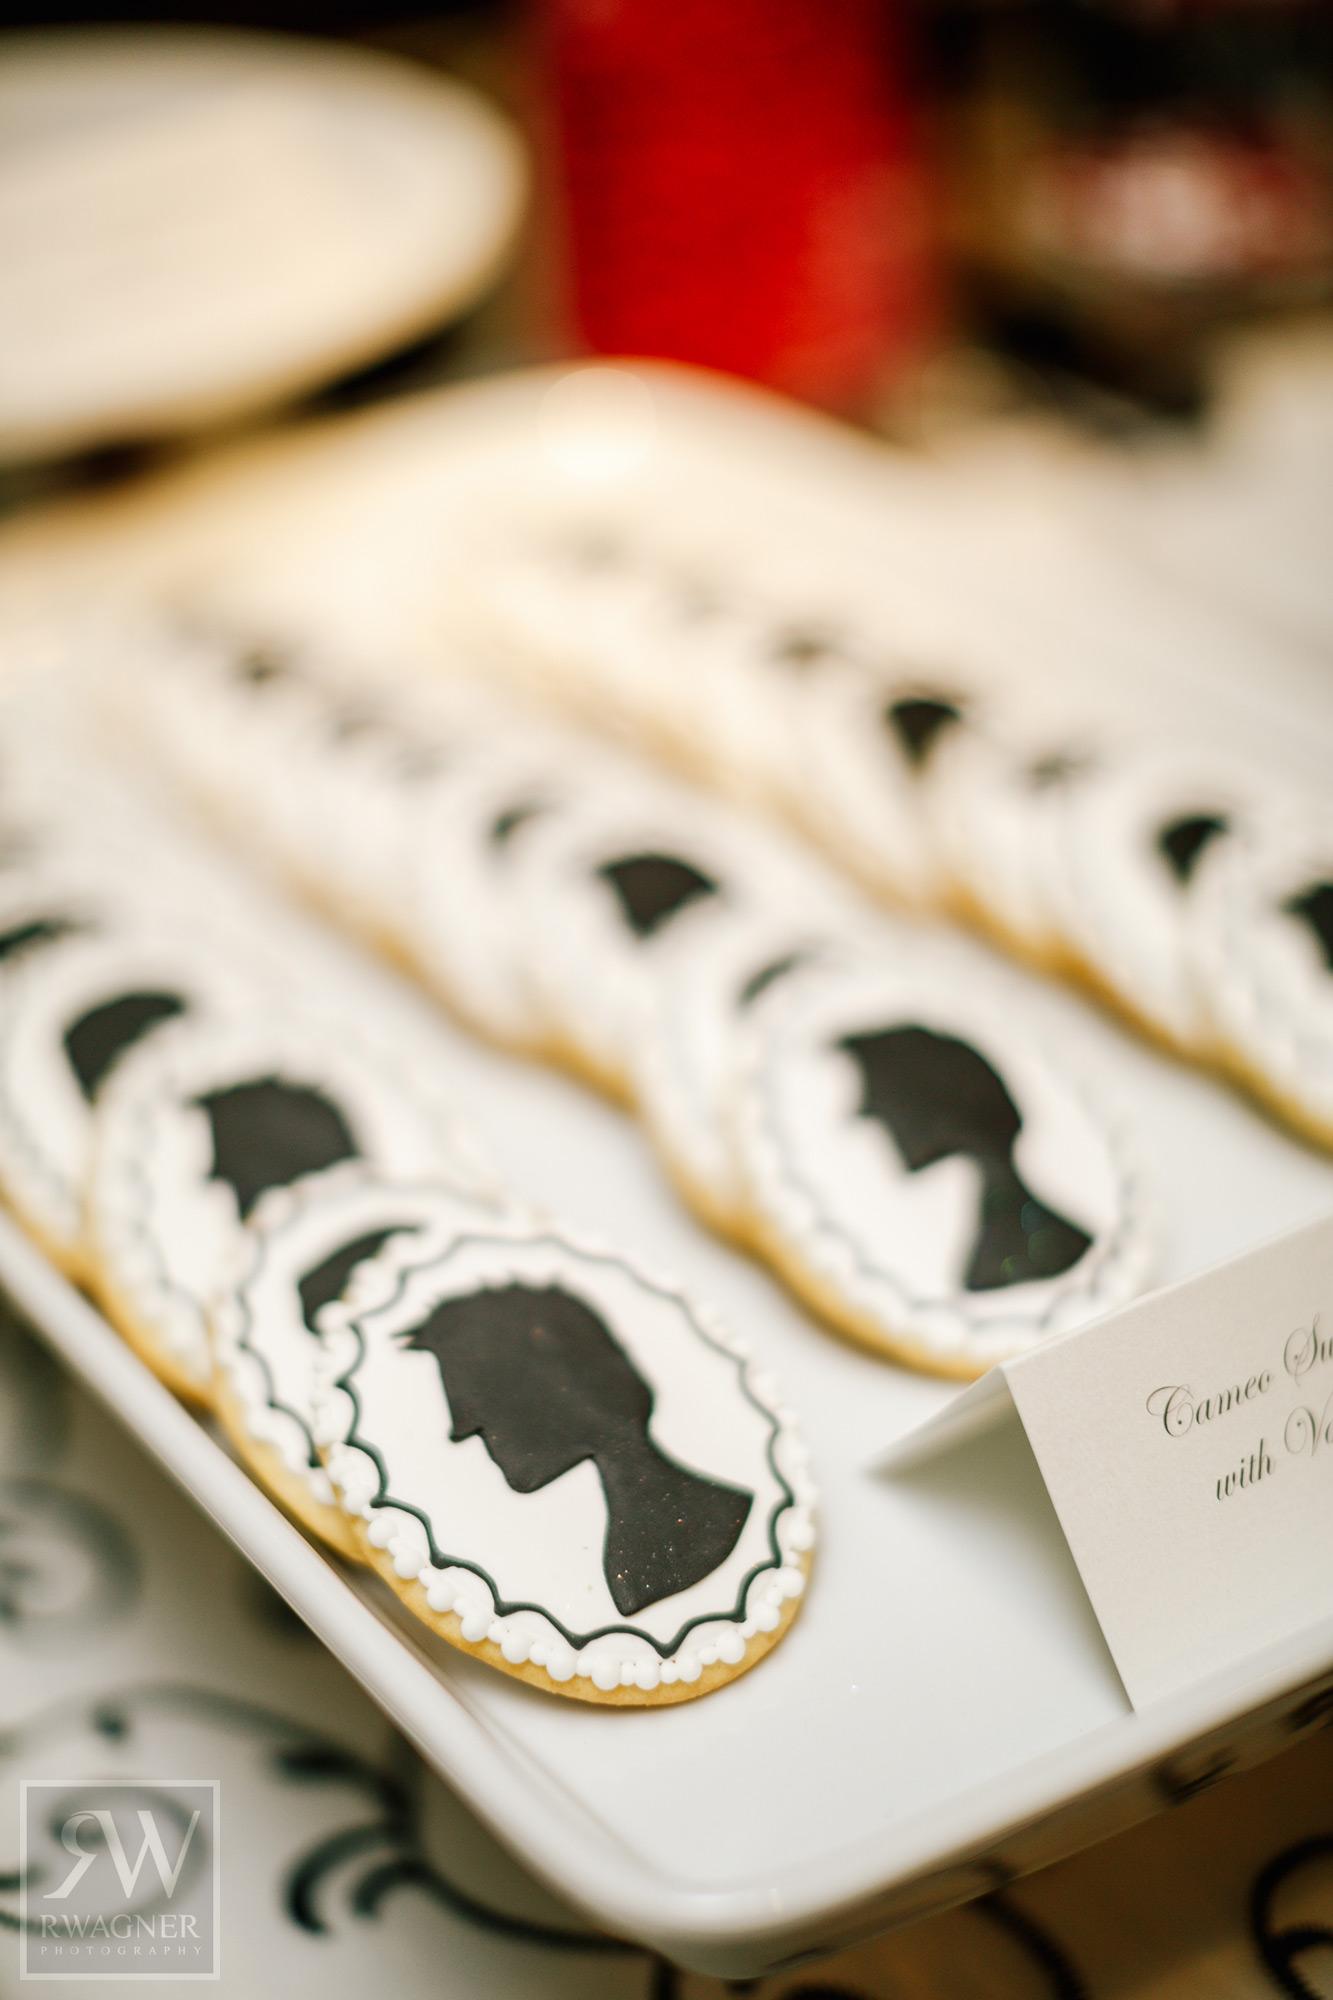 ceci_new_york_luxury_wedding_invitations_couture_red_black_white_real_wedding_dramatic_inn_at_longshore_v286_29.jpg